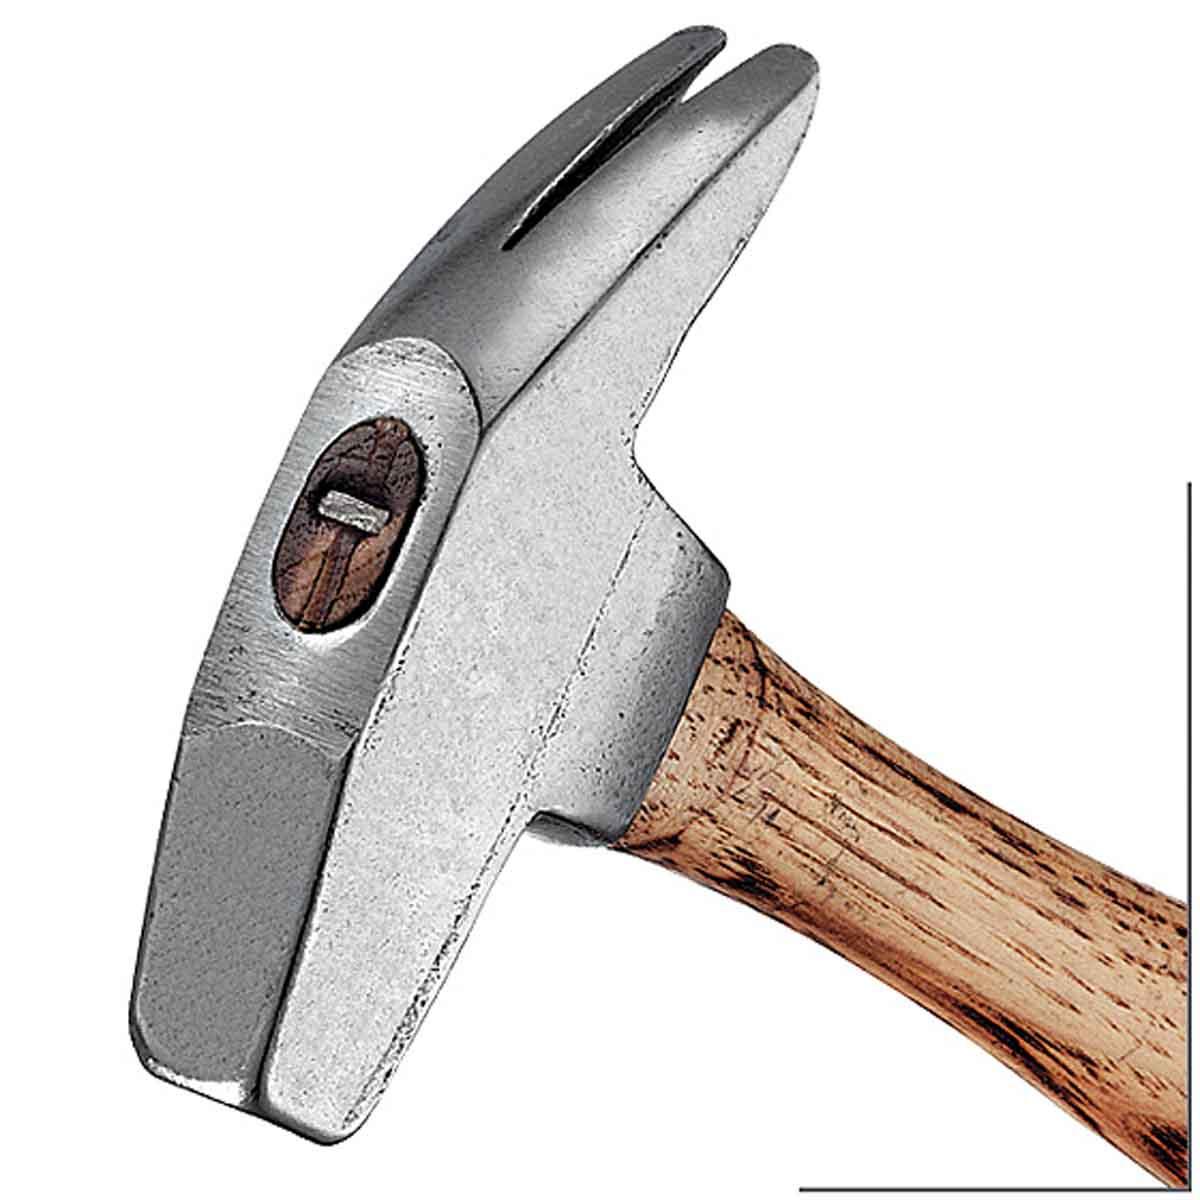 Diamond Nailing Hammers